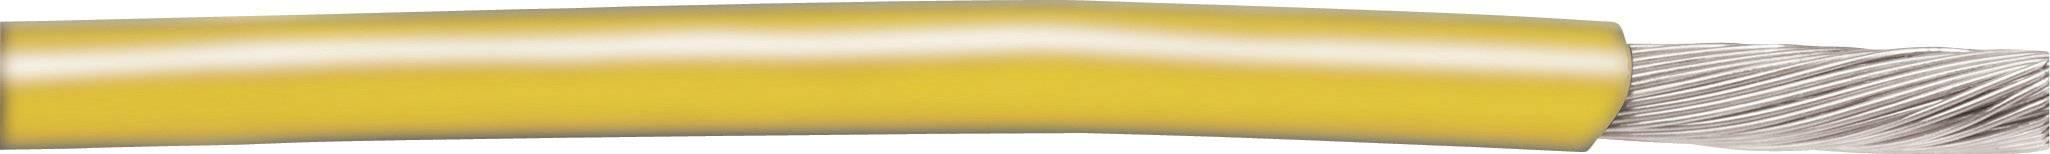 Pletenica EcoWire 1 x 0.52 mm, rumena AlphaWire 6714 30.5 m